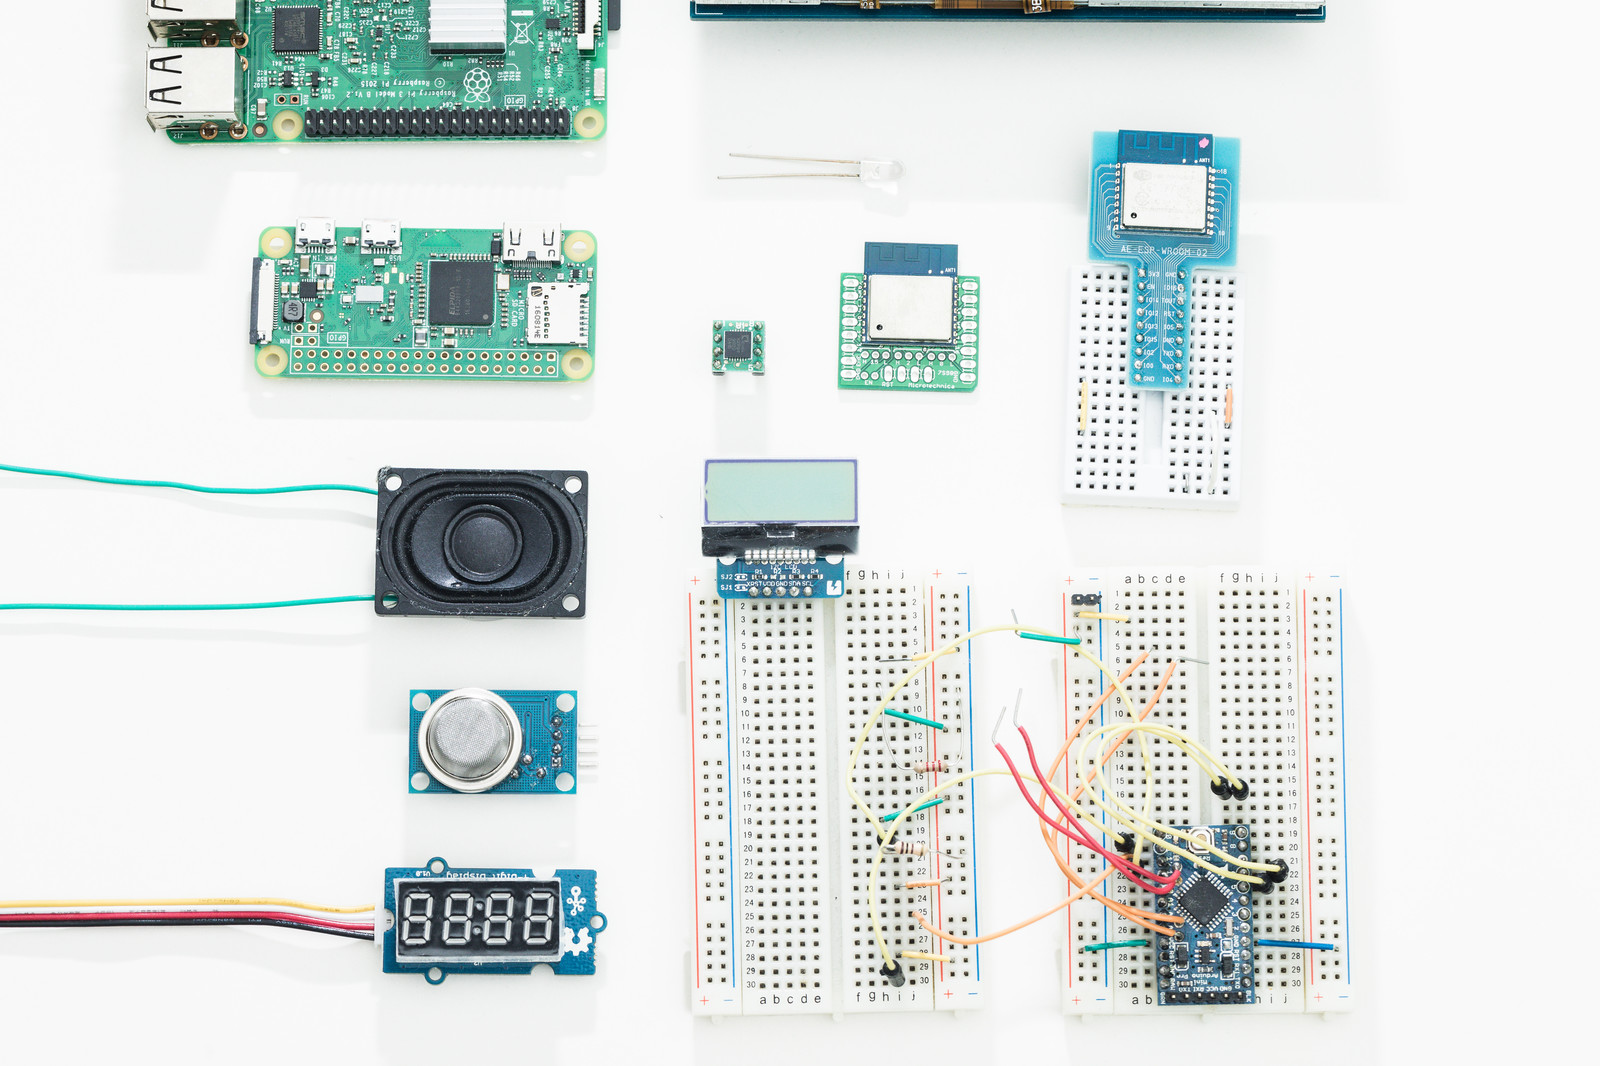 「RaspberryPiと電子工作部品」の写真